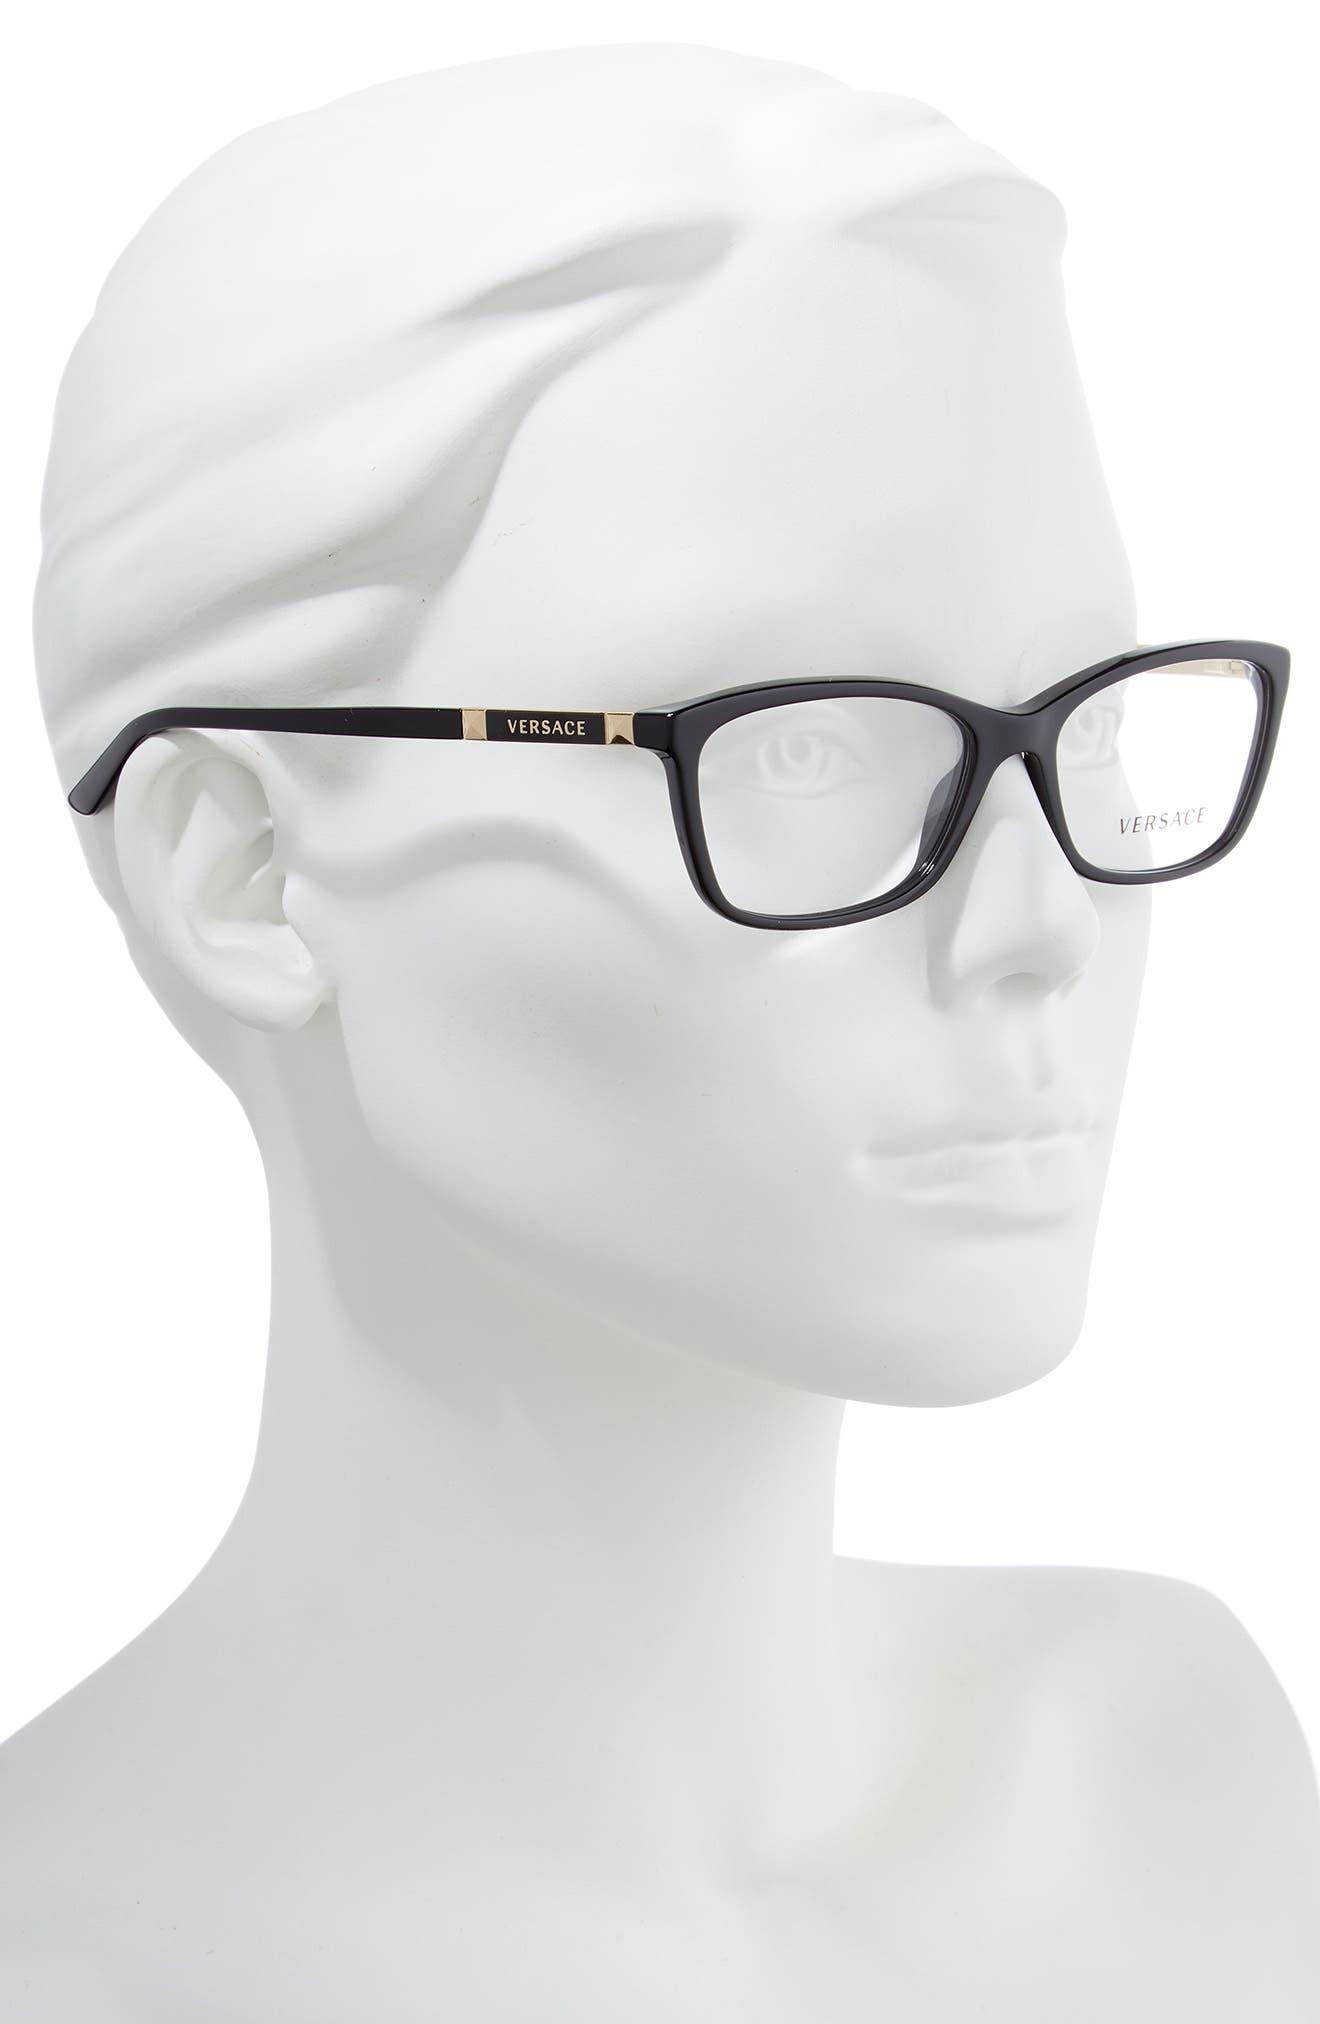 VERSACE,                             54mm Optical Glasses,                             Alternate thumbnail 2, color,                             BLACK